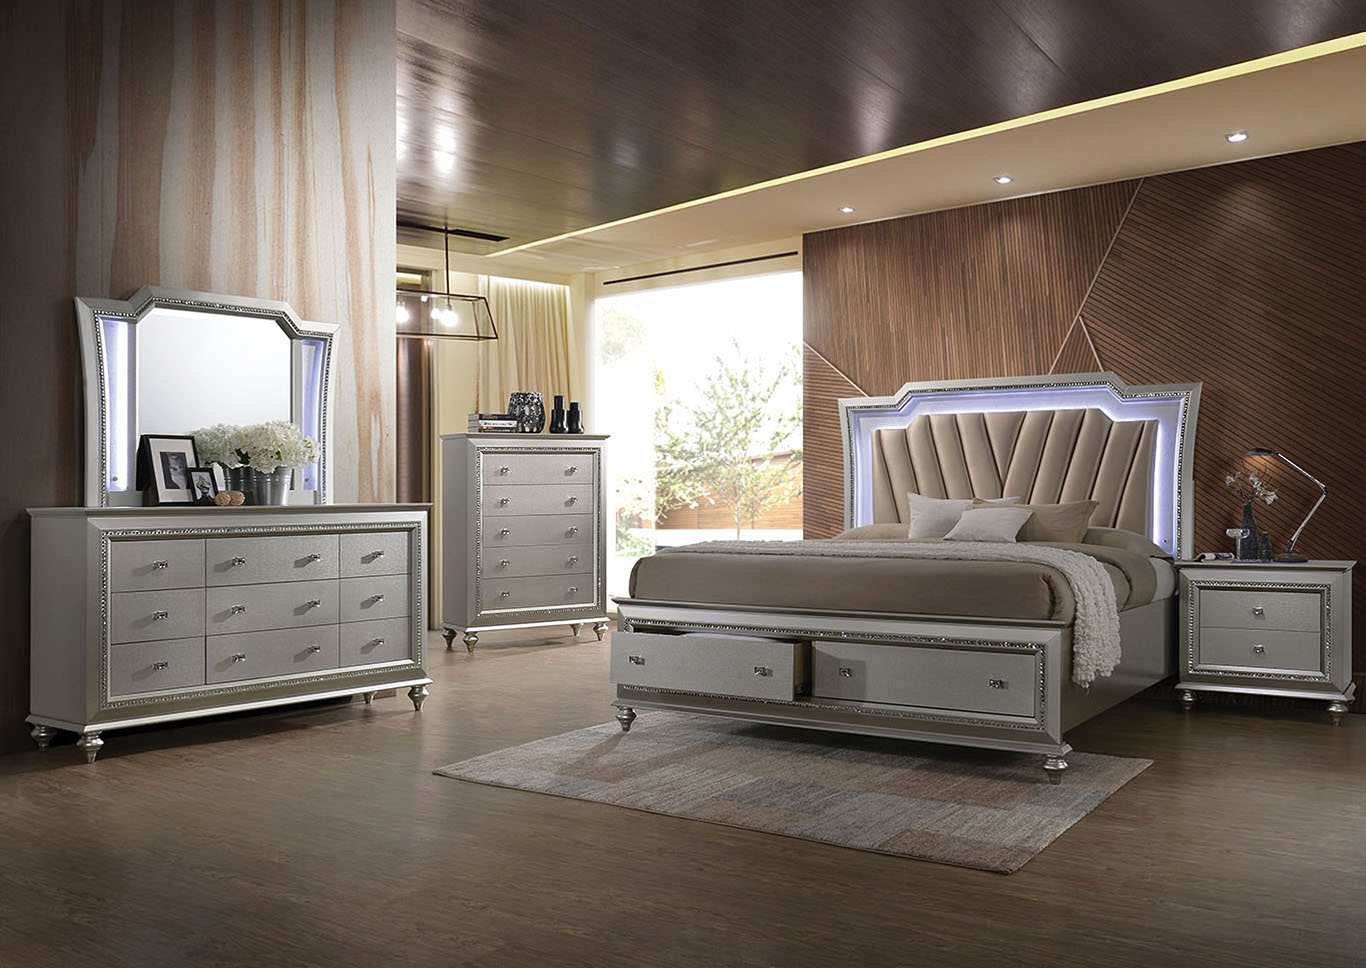 Kaitlyn champagne california king led storage bed w dresser mirroracme